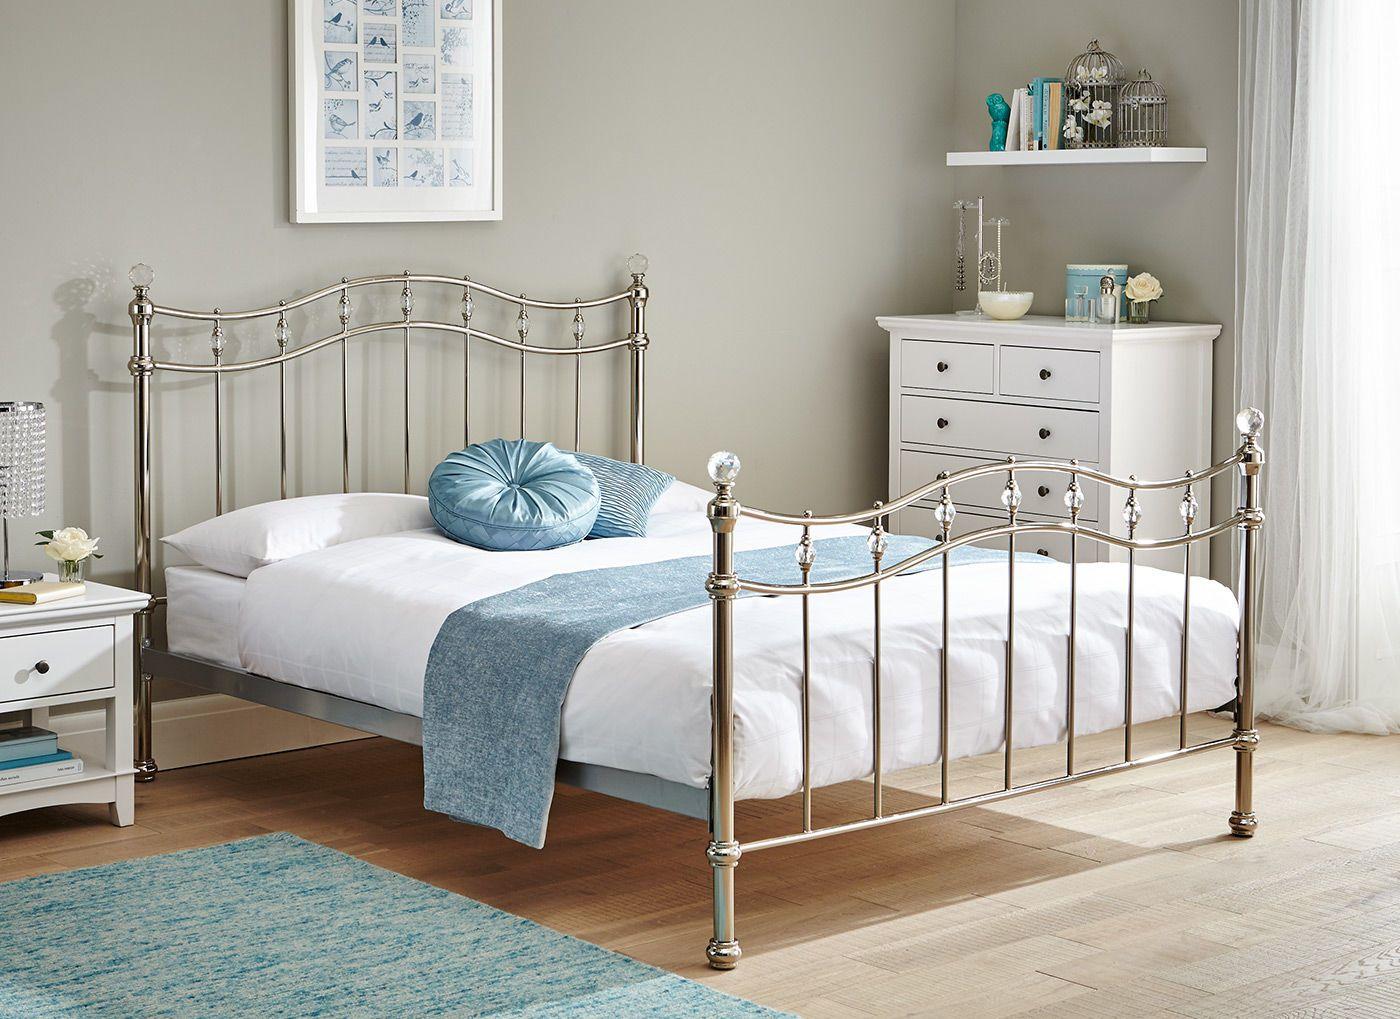 Louis Chrome Metal Bed Frame Divan Hogar